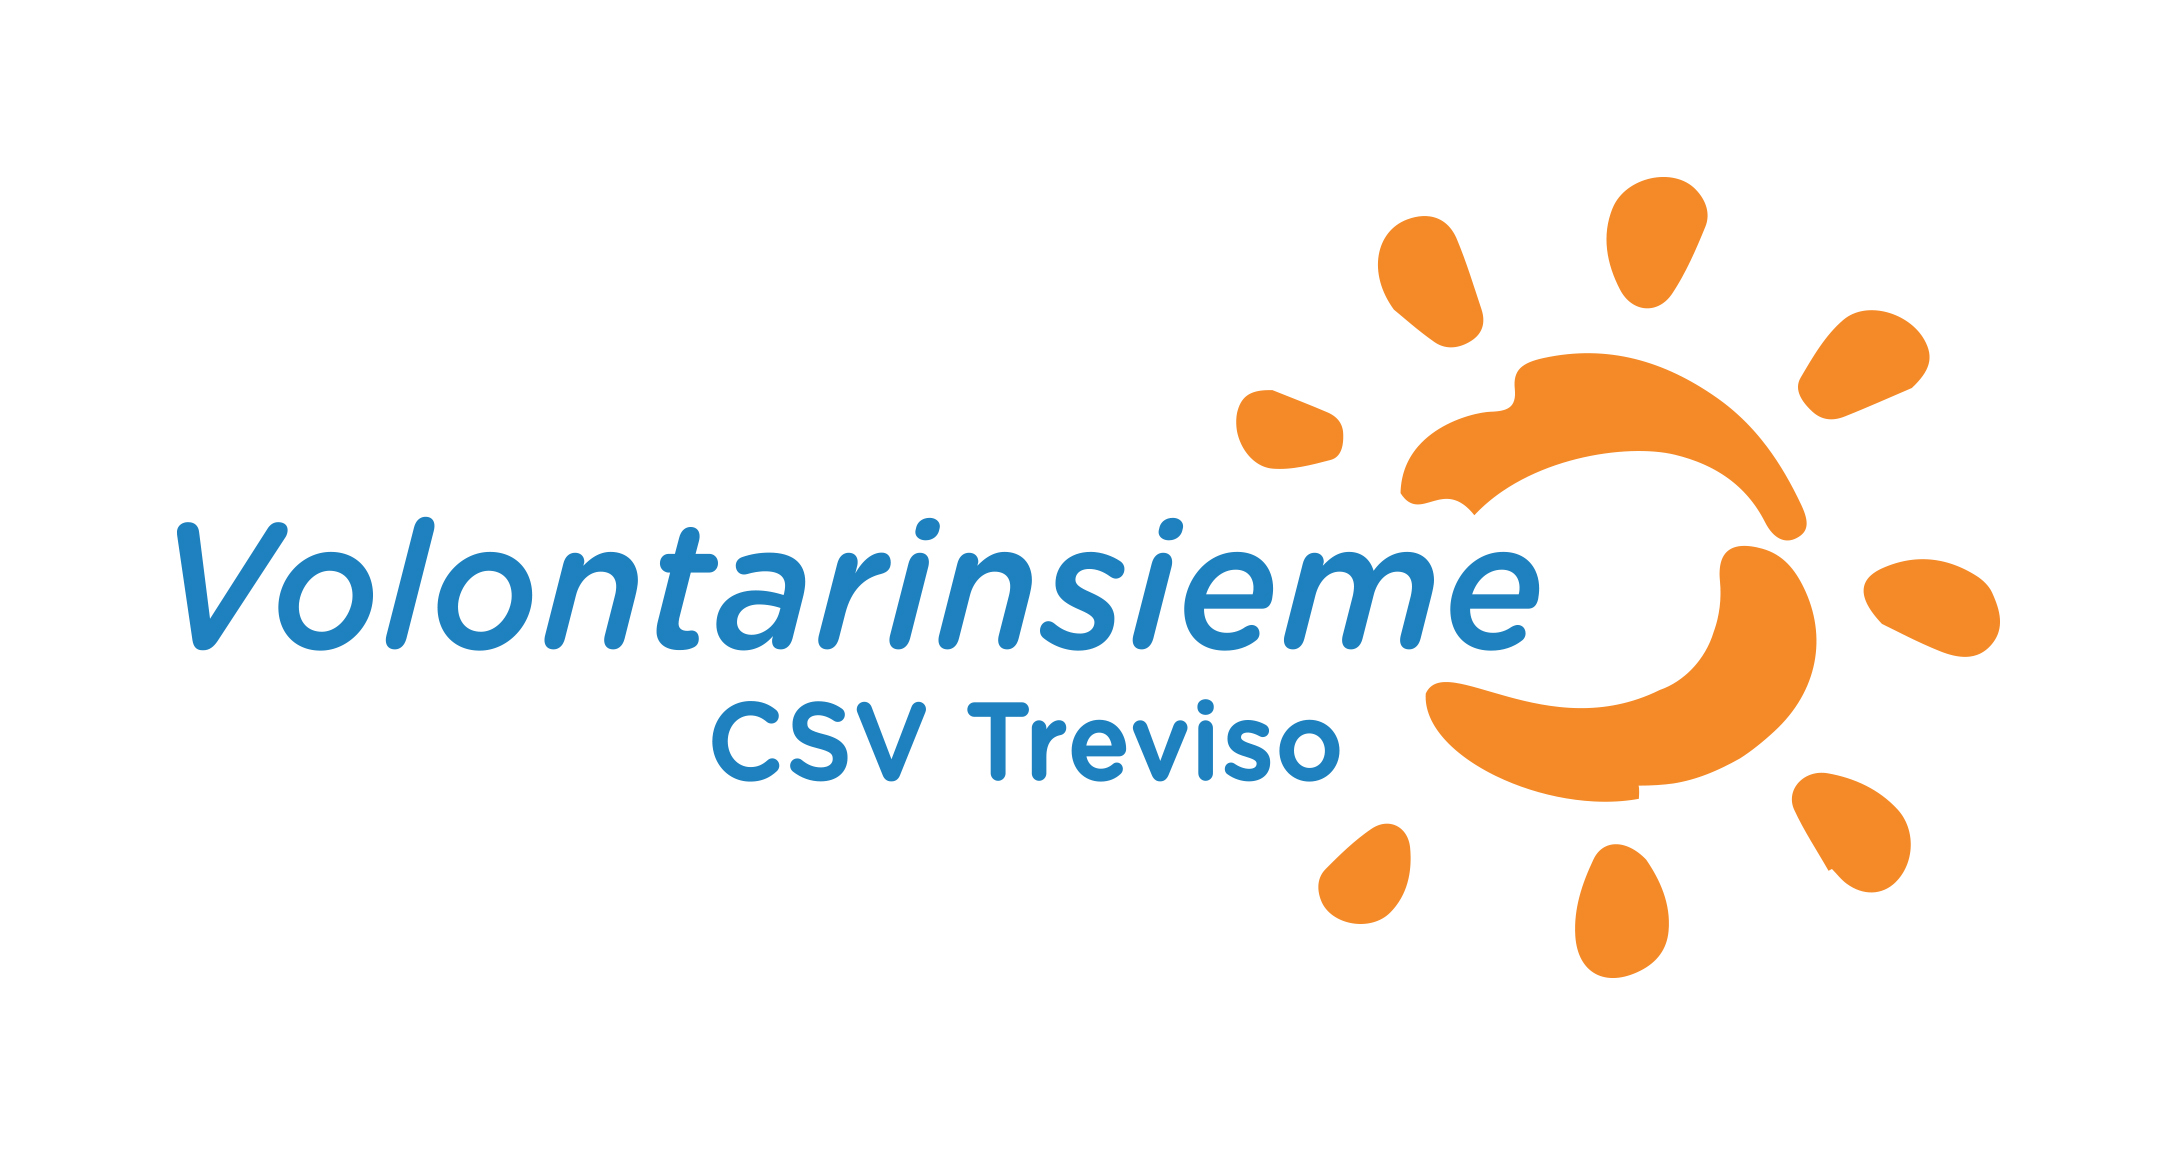 Volontarinsieme - CSV Treviso